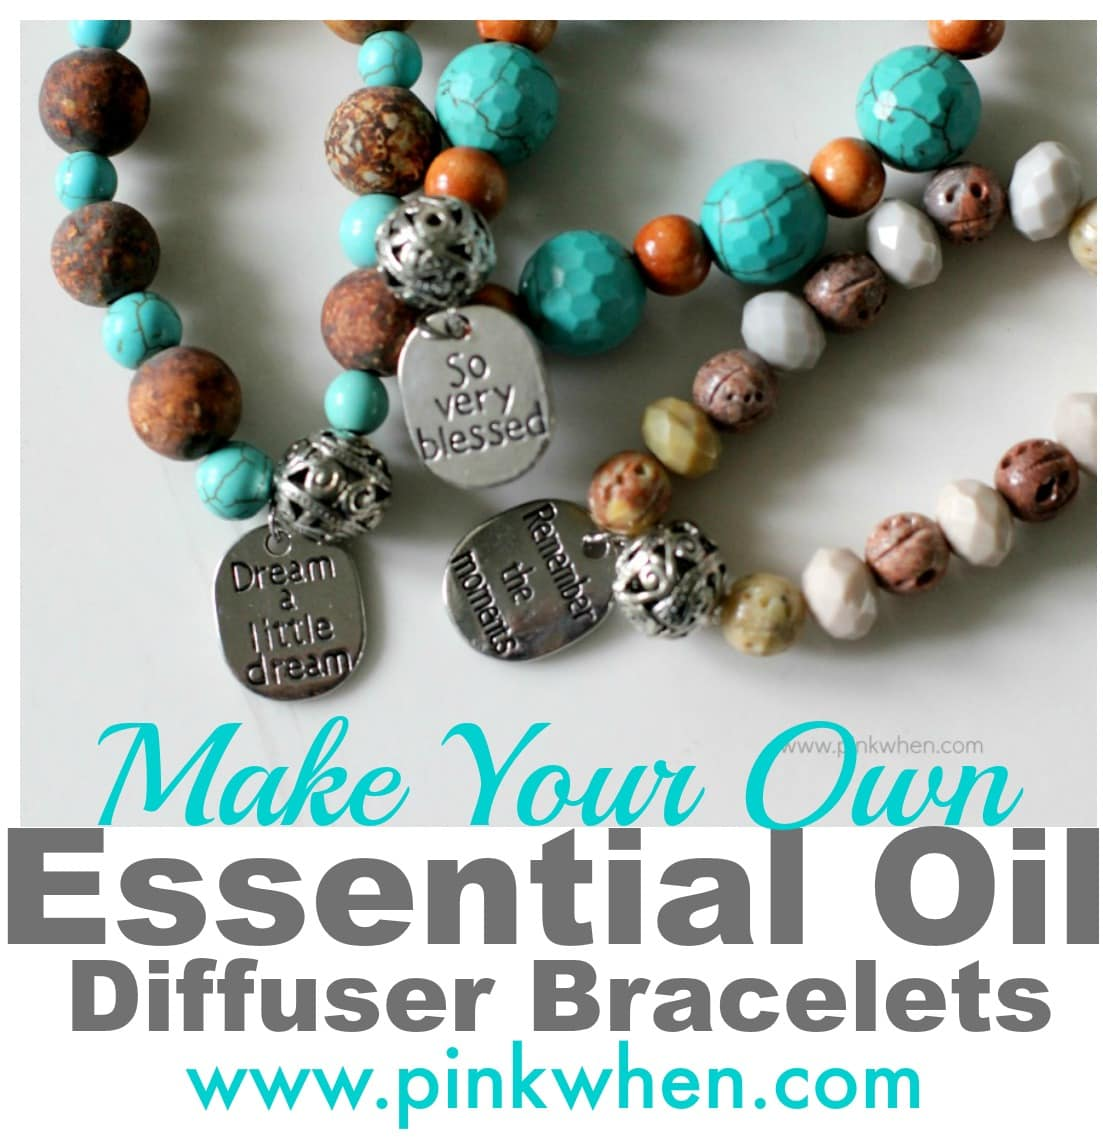 Essential Oil Diffuser Bracelet Pinkwhen